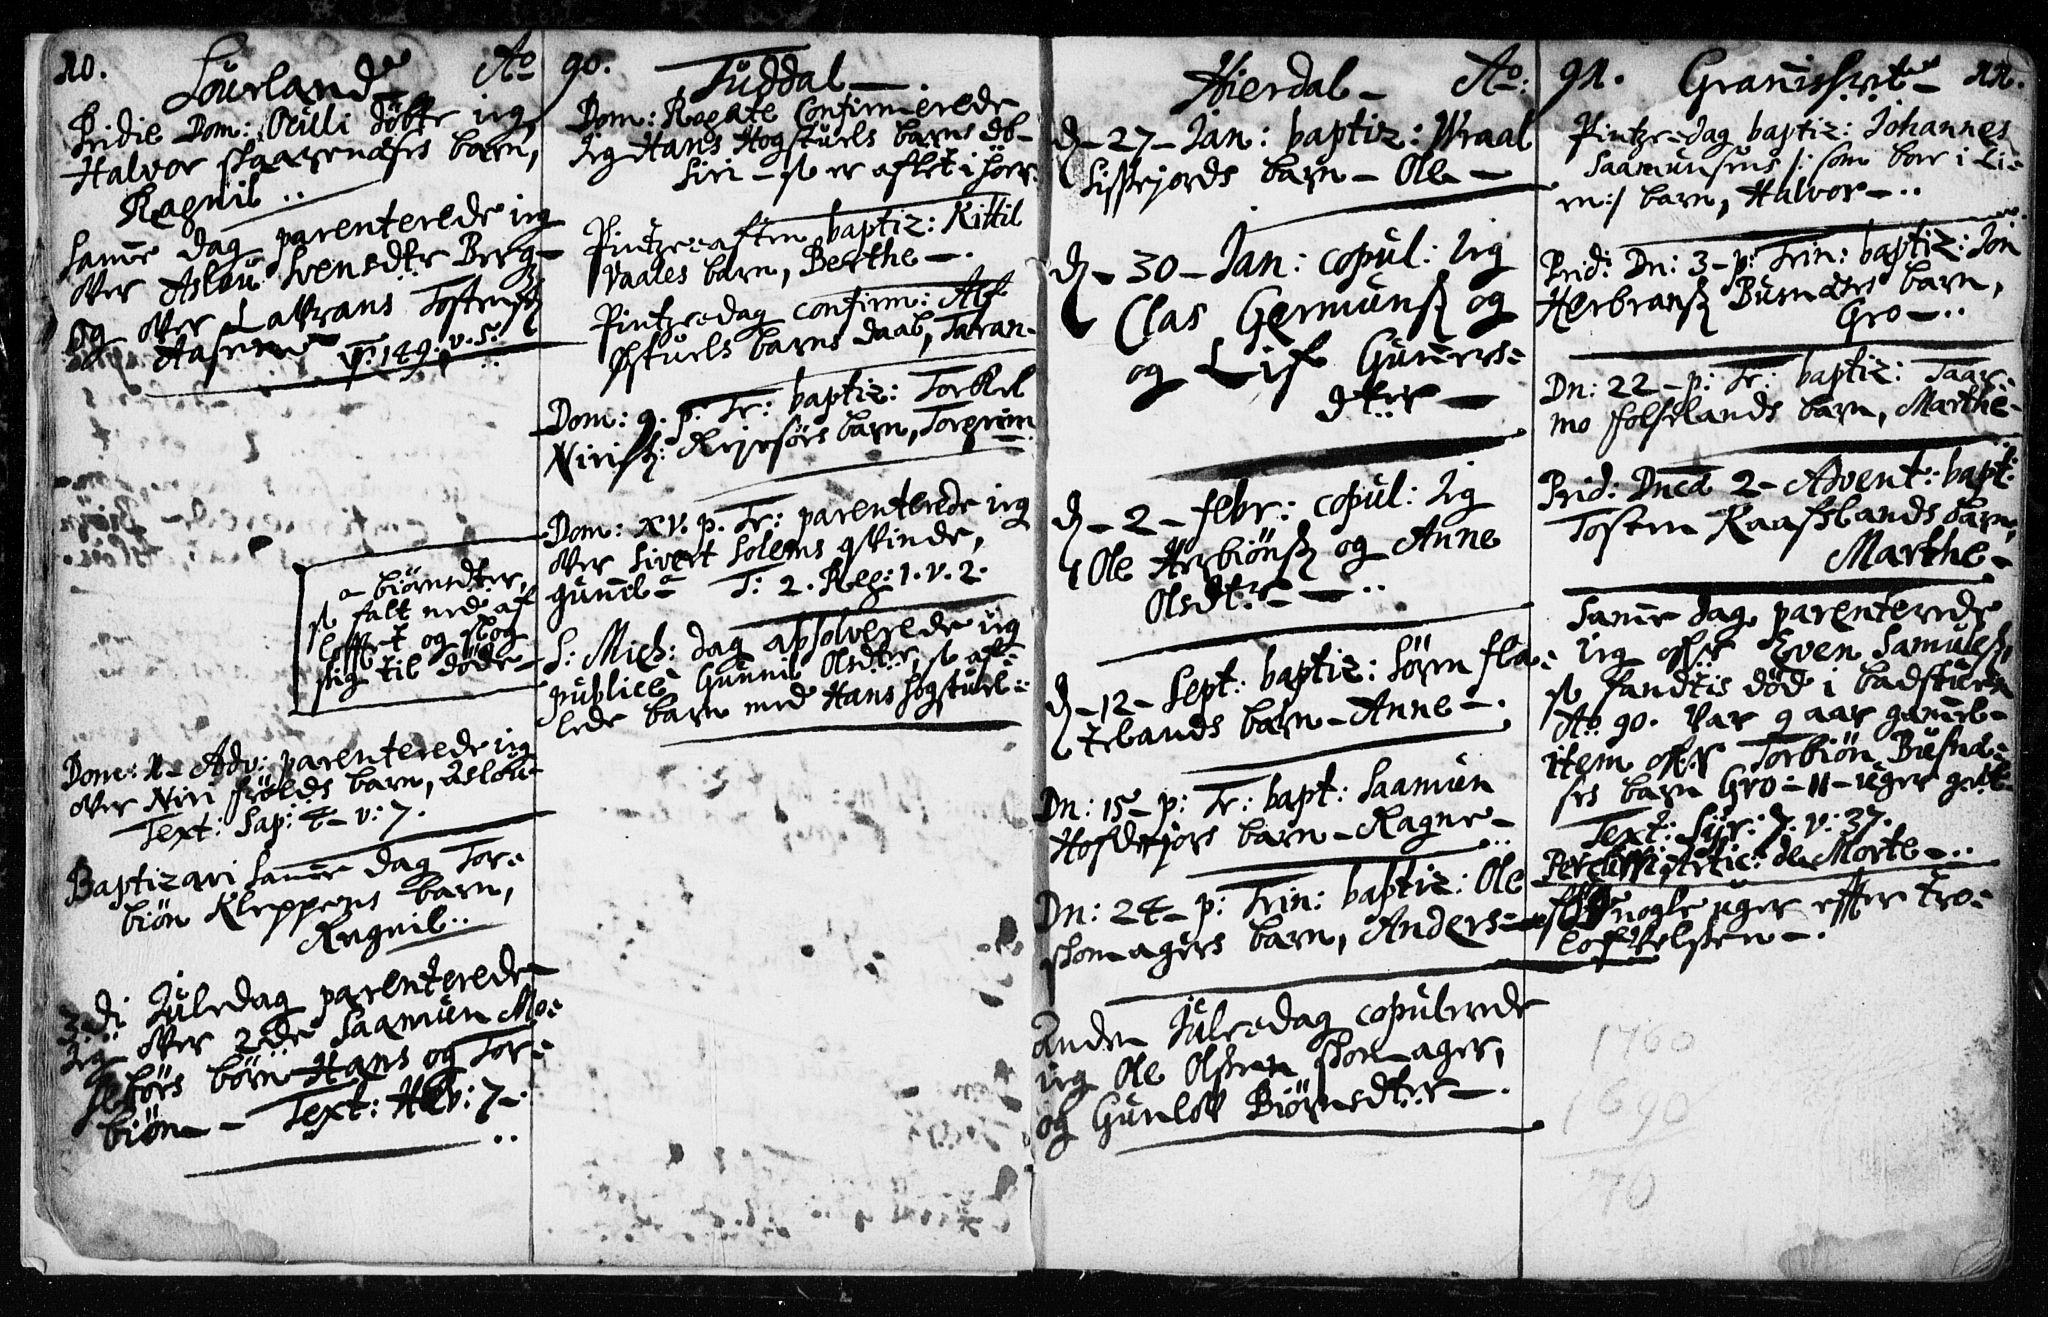 SAKO, Hjartdal kirkebøker, F/Fa/L0001: Ministerialbok nr. I 1, 1685-1714, s. 10-11